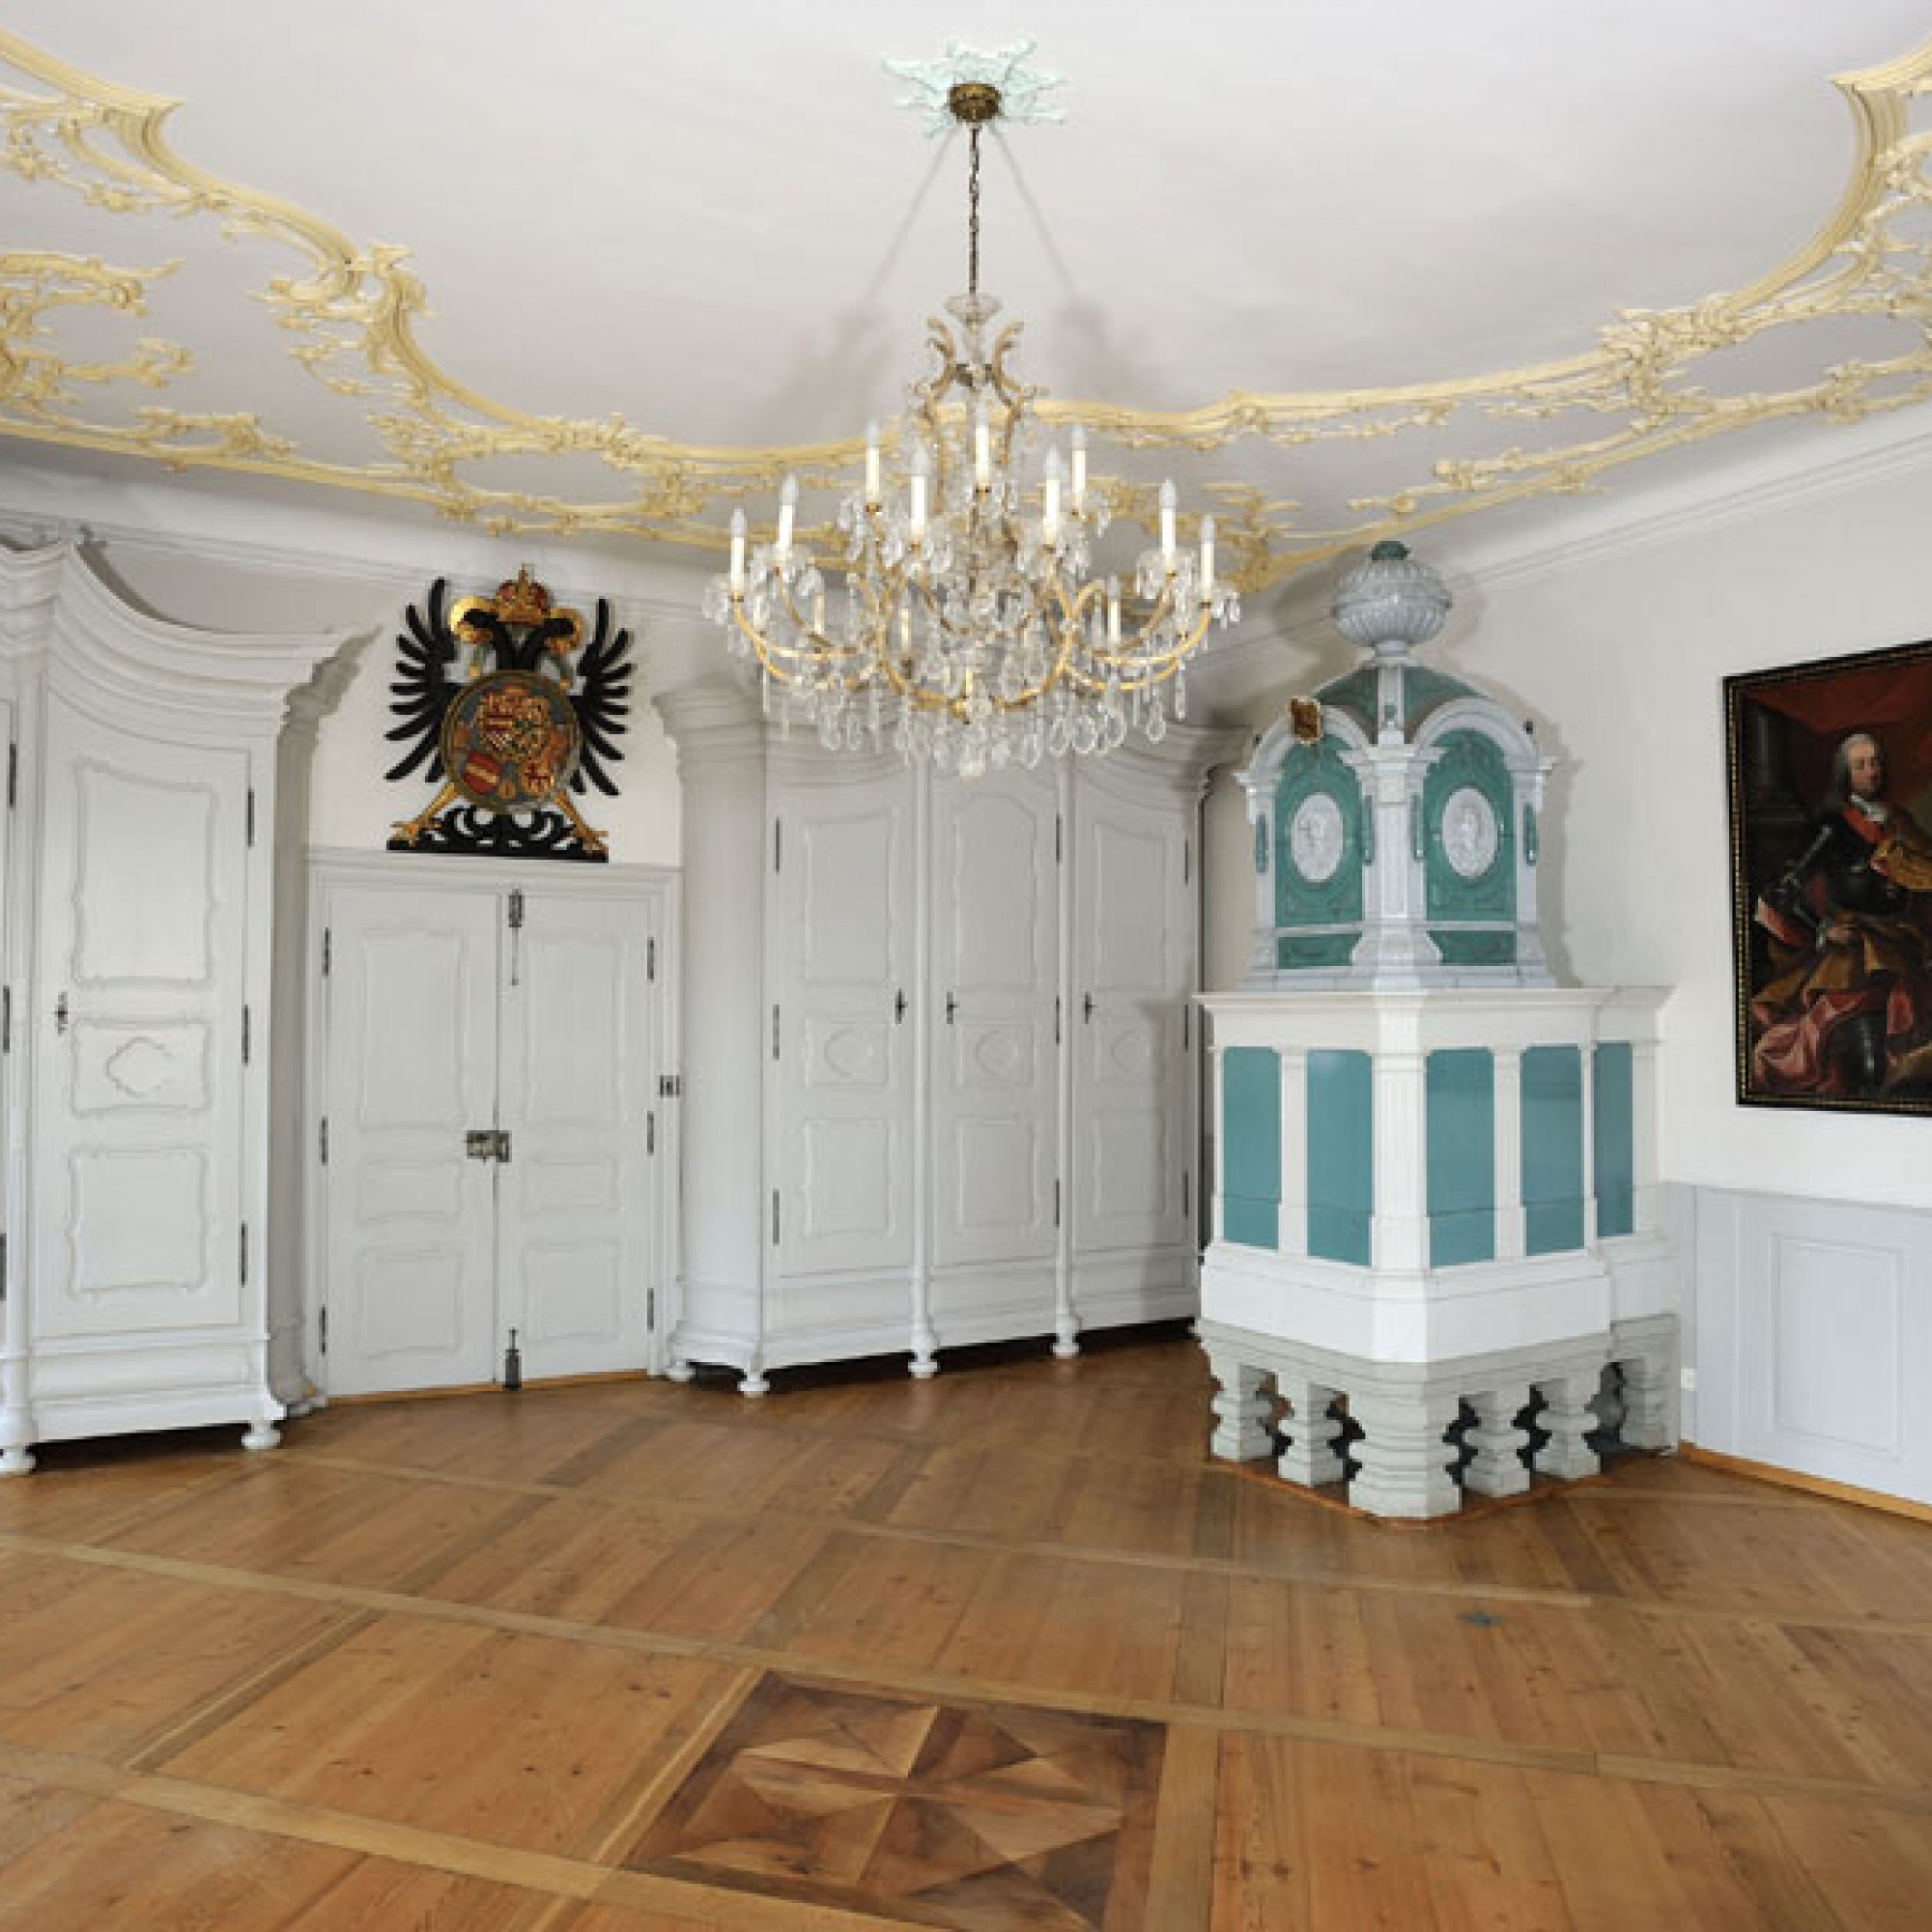 Barocke Pracht im ehemaligen Rathaus Laufenburg AG. (Bild: © Kantonale Denkmalpflege Aargau, Christine Seiler)